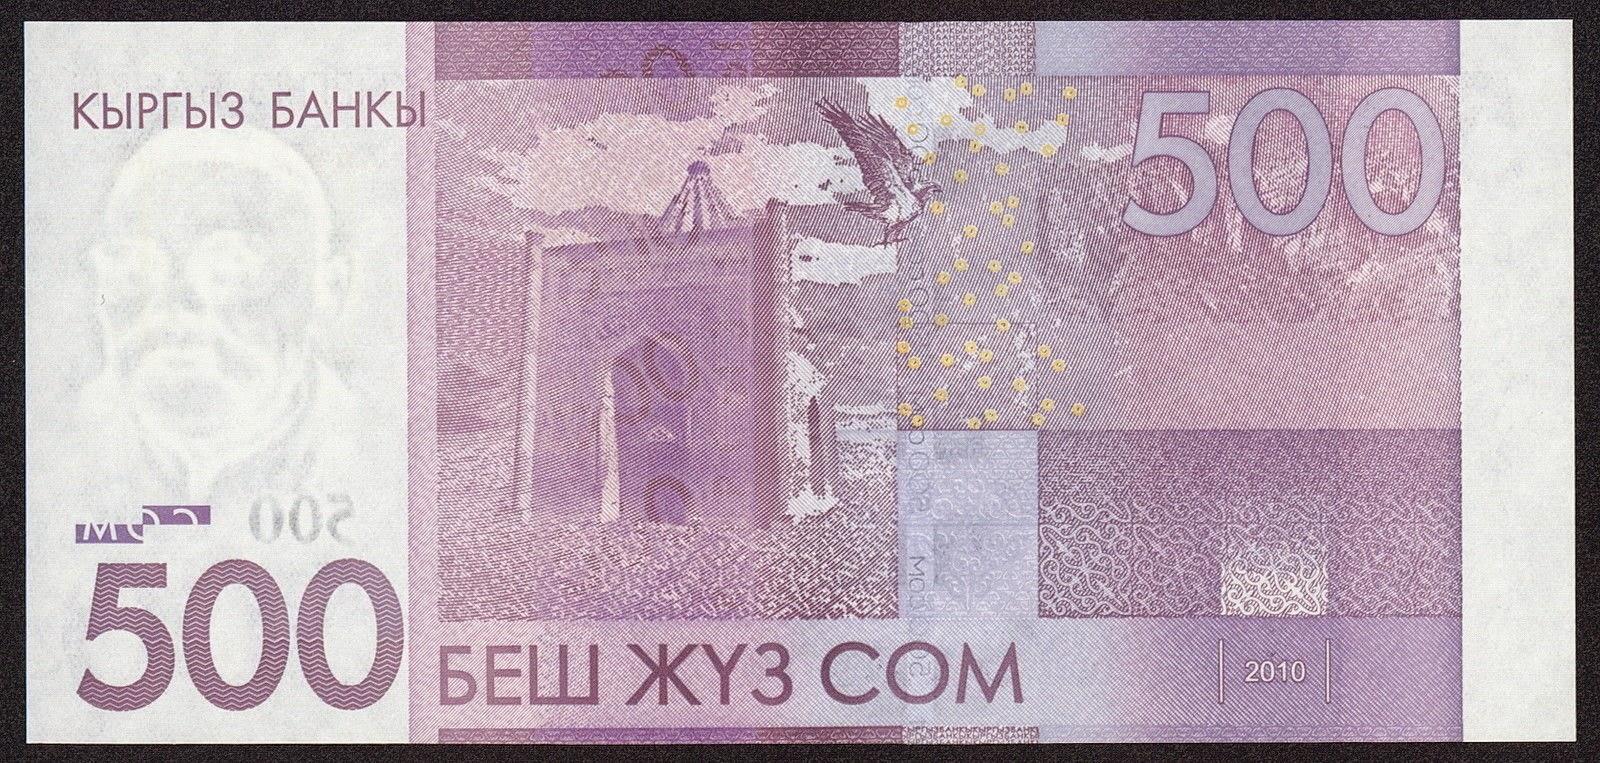 Kyrgyzstan currency 500 Som banknote